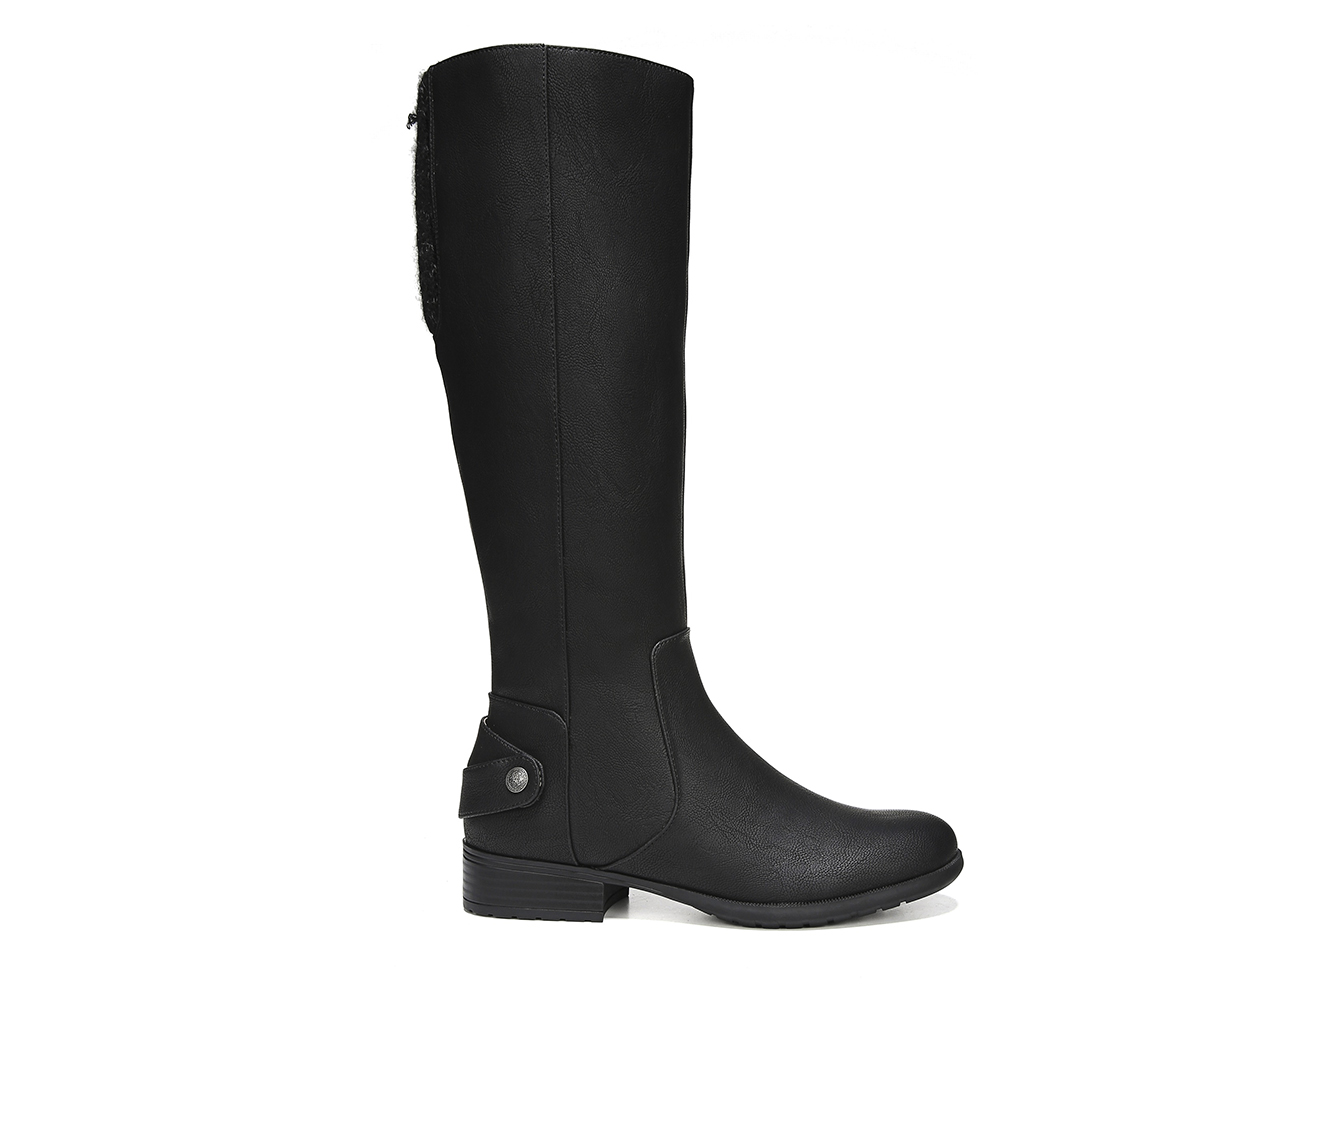 LifeStride X Amy Women's Boots (Black - Faux Leather)